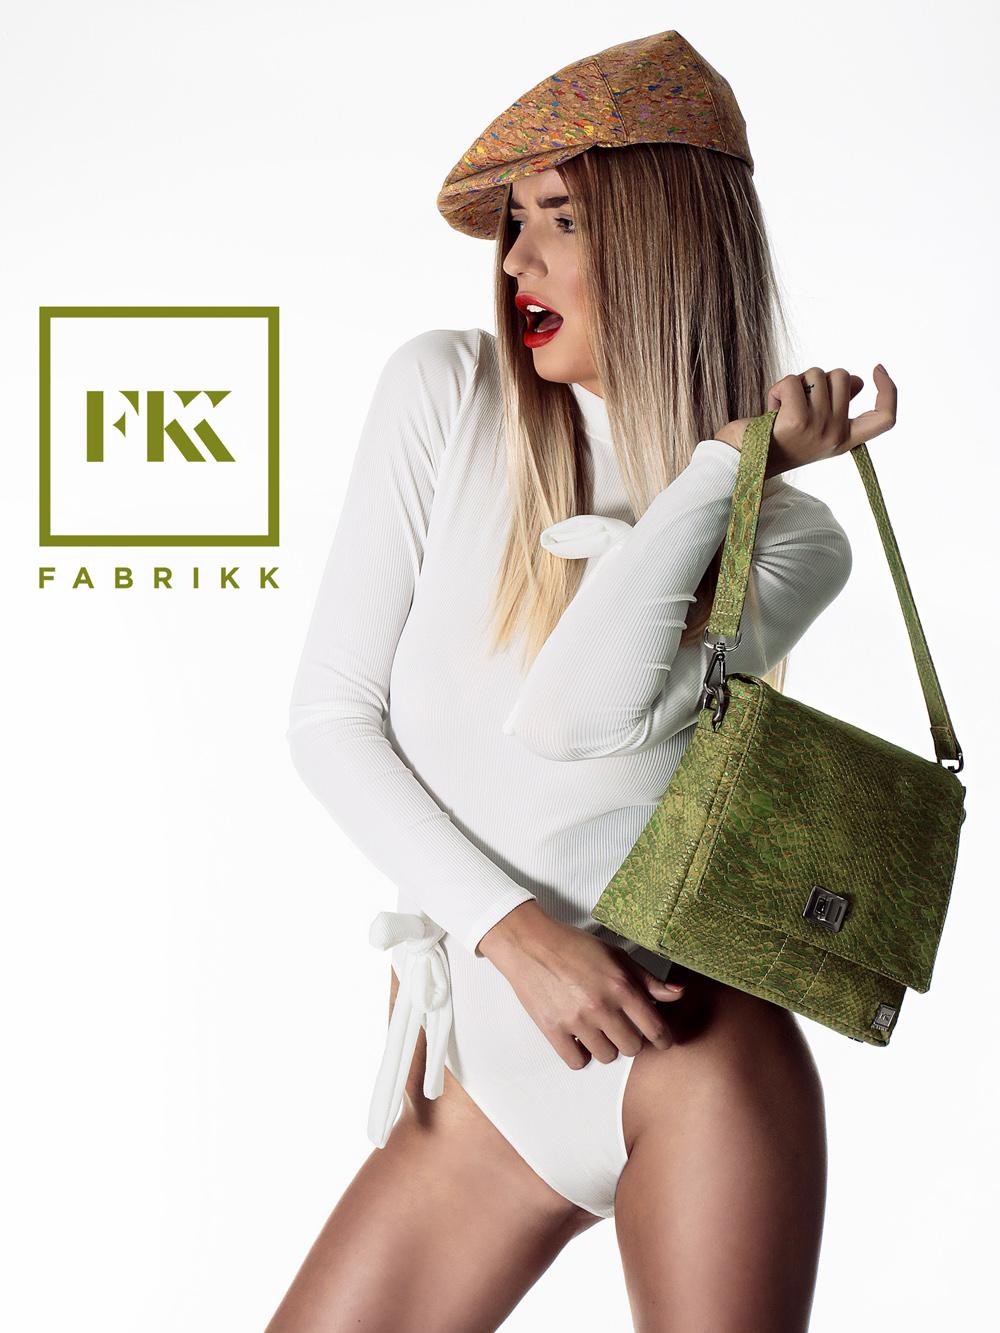 Fabrikk campaign SS17 ft Tom Zanetti and Anna Tyburska shot by Studio Voir 6